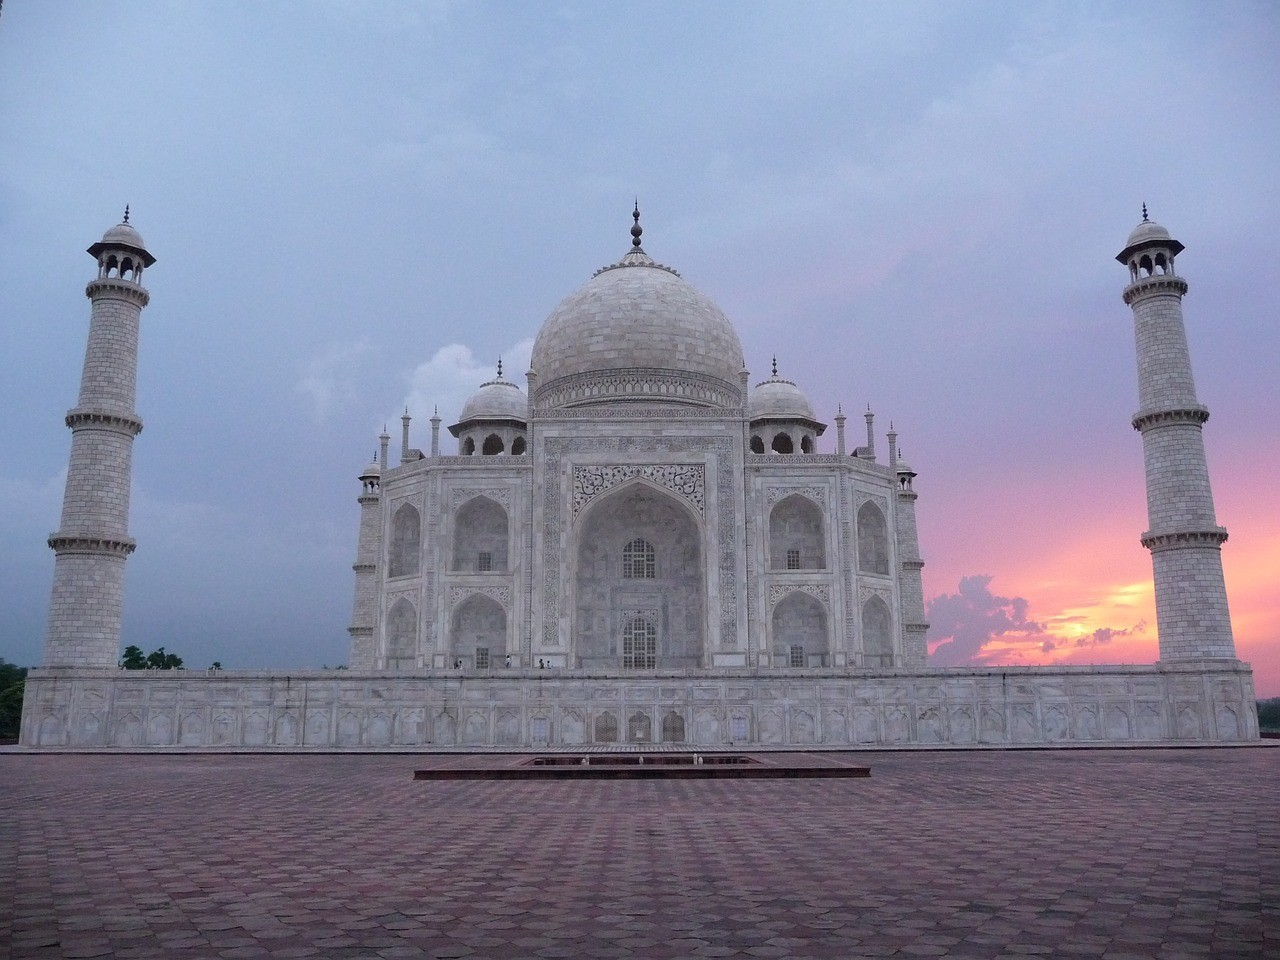 delhi to agra easy cheap how to make a day trip to the taj mahal